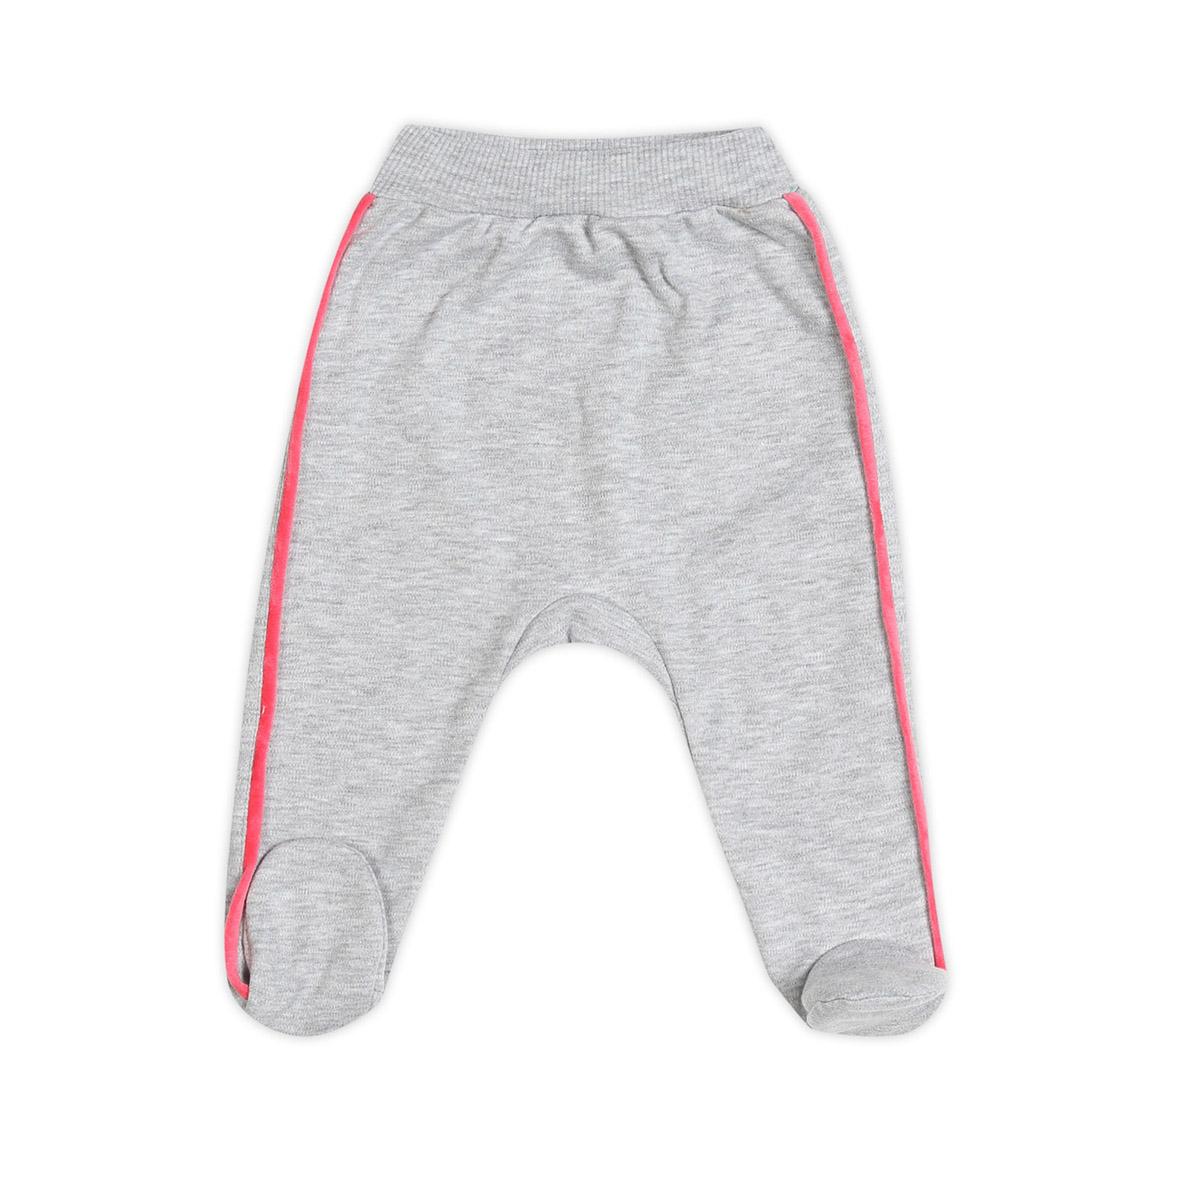 Ползунки с ножками Ёмаё Спорт (26-265) рост 80 серый меланж<br>